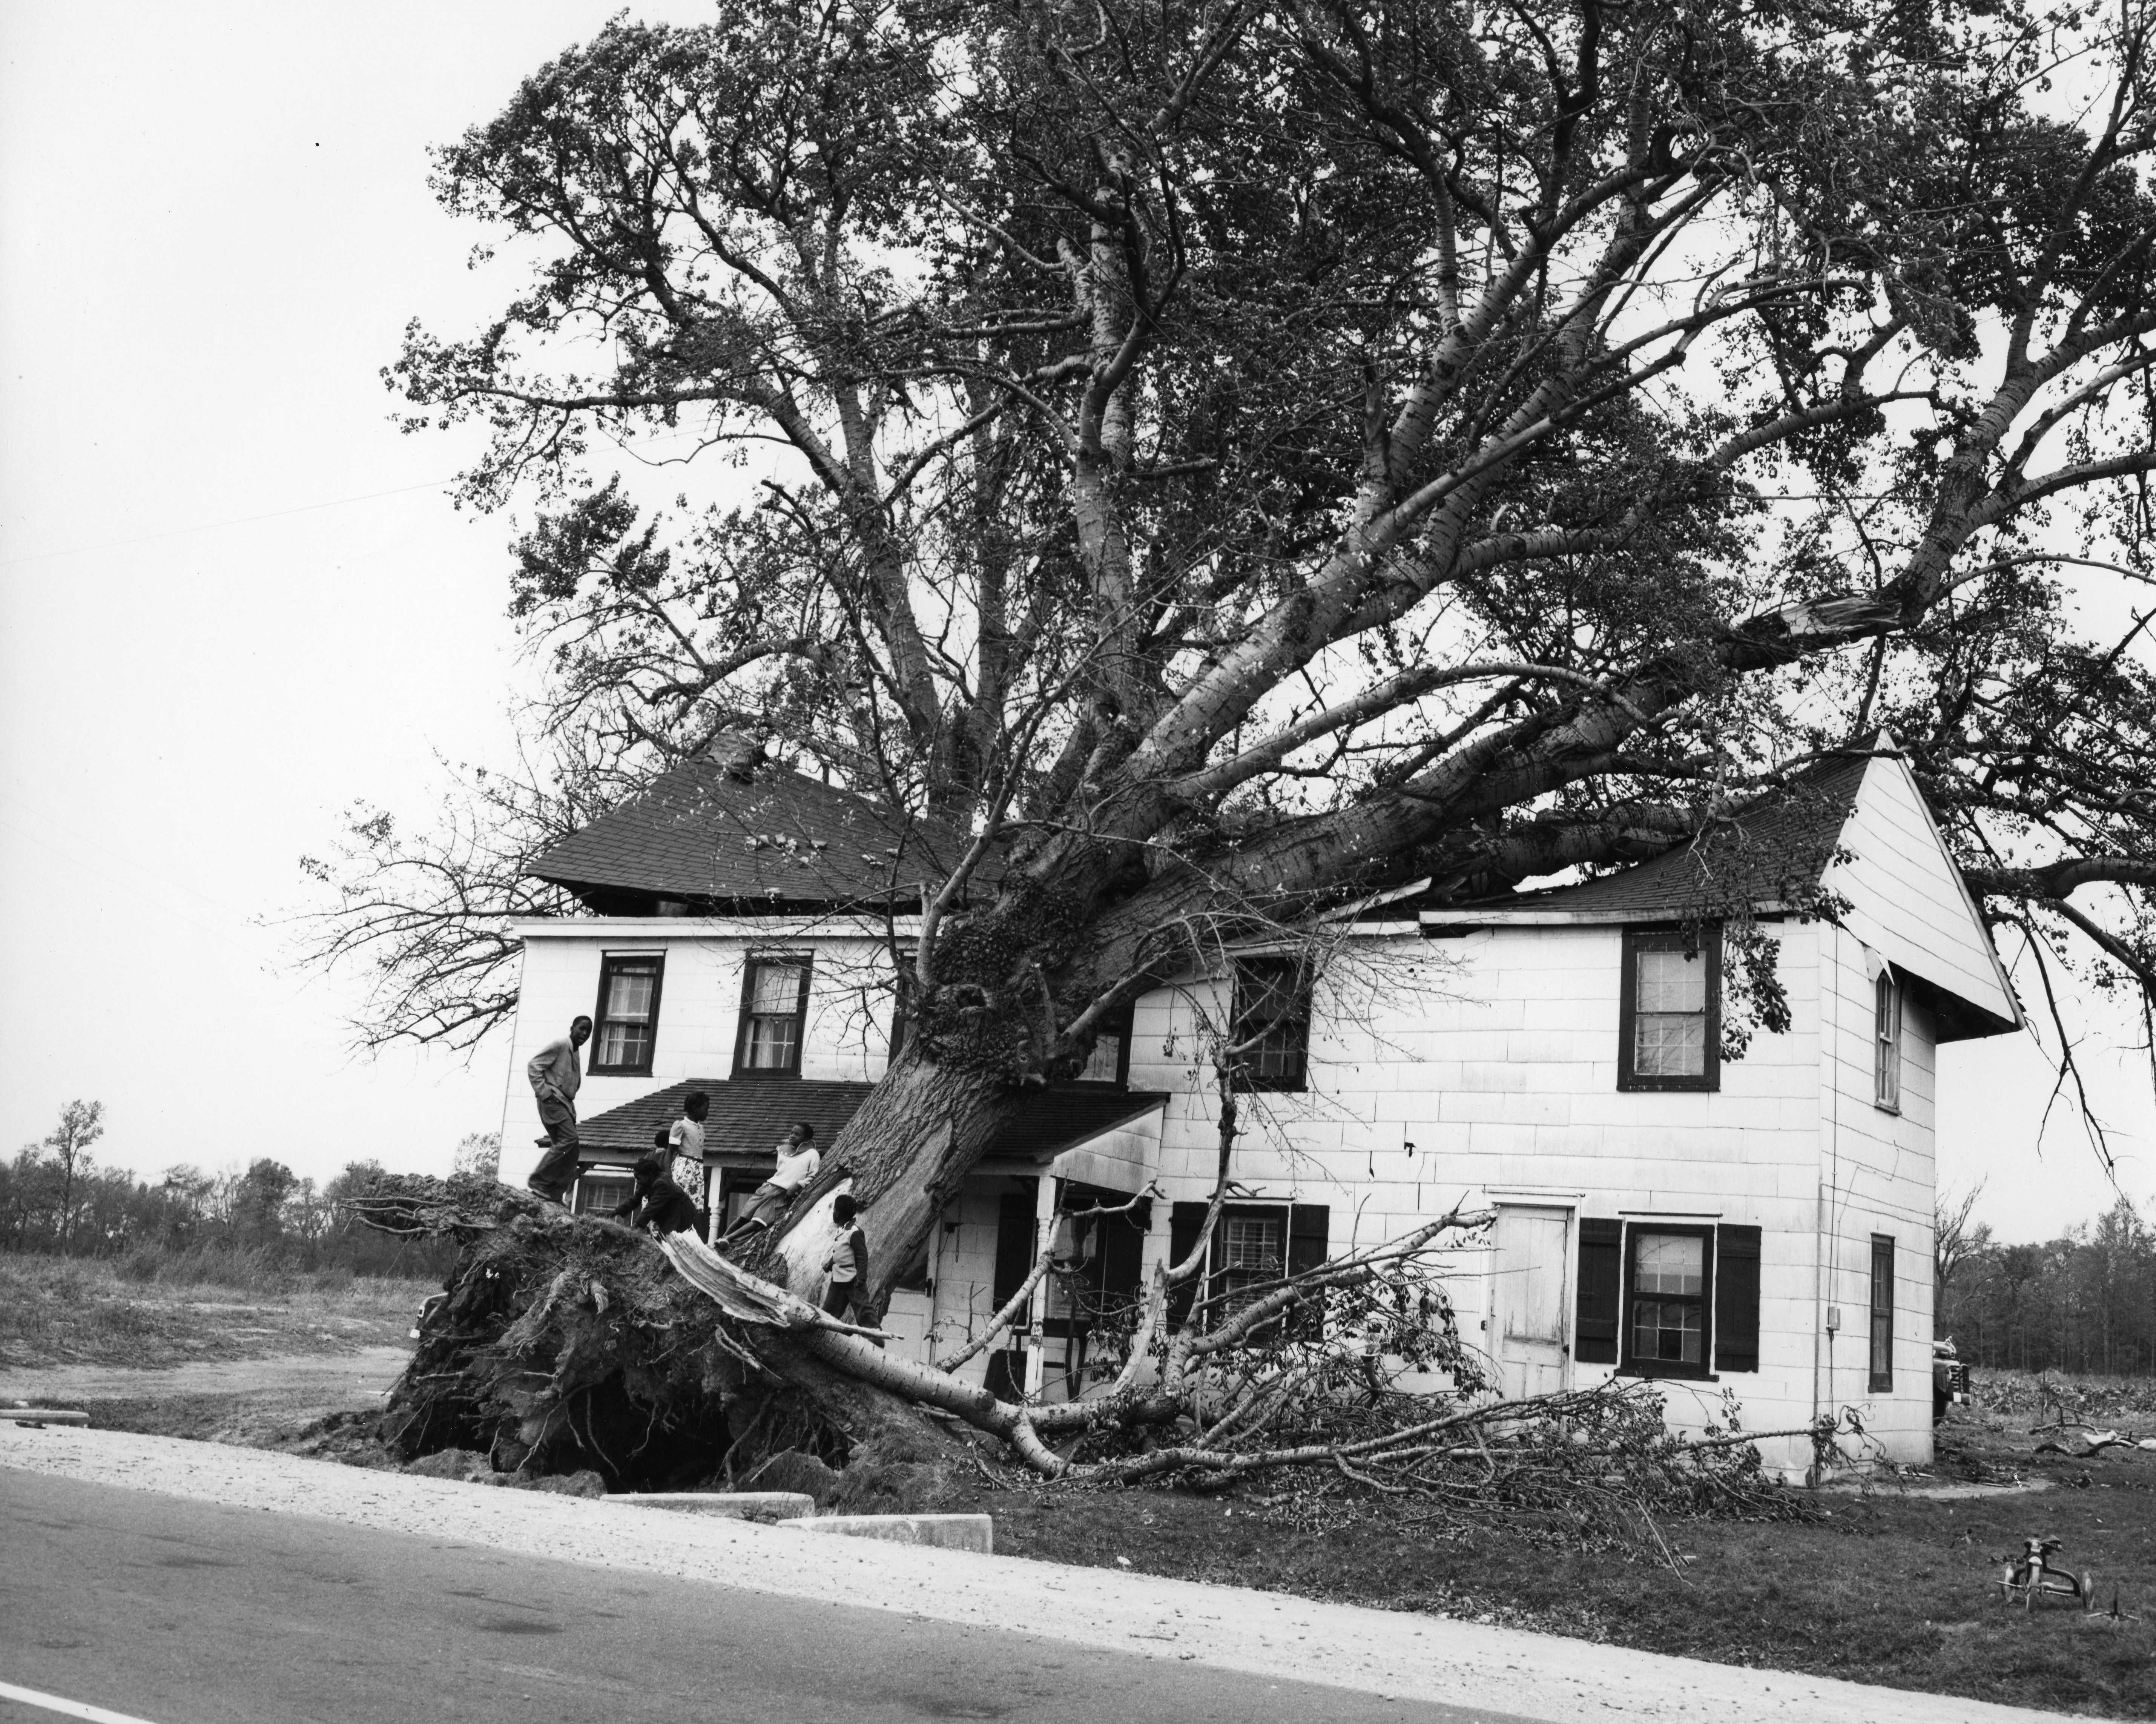 Hurricane Hazel October 1954 House Damaged By Winds In Hartly Delaware 1540 000 000 2821 Delaware Public Ar Hurricane Hazel Atlantic Hurricane Hartly